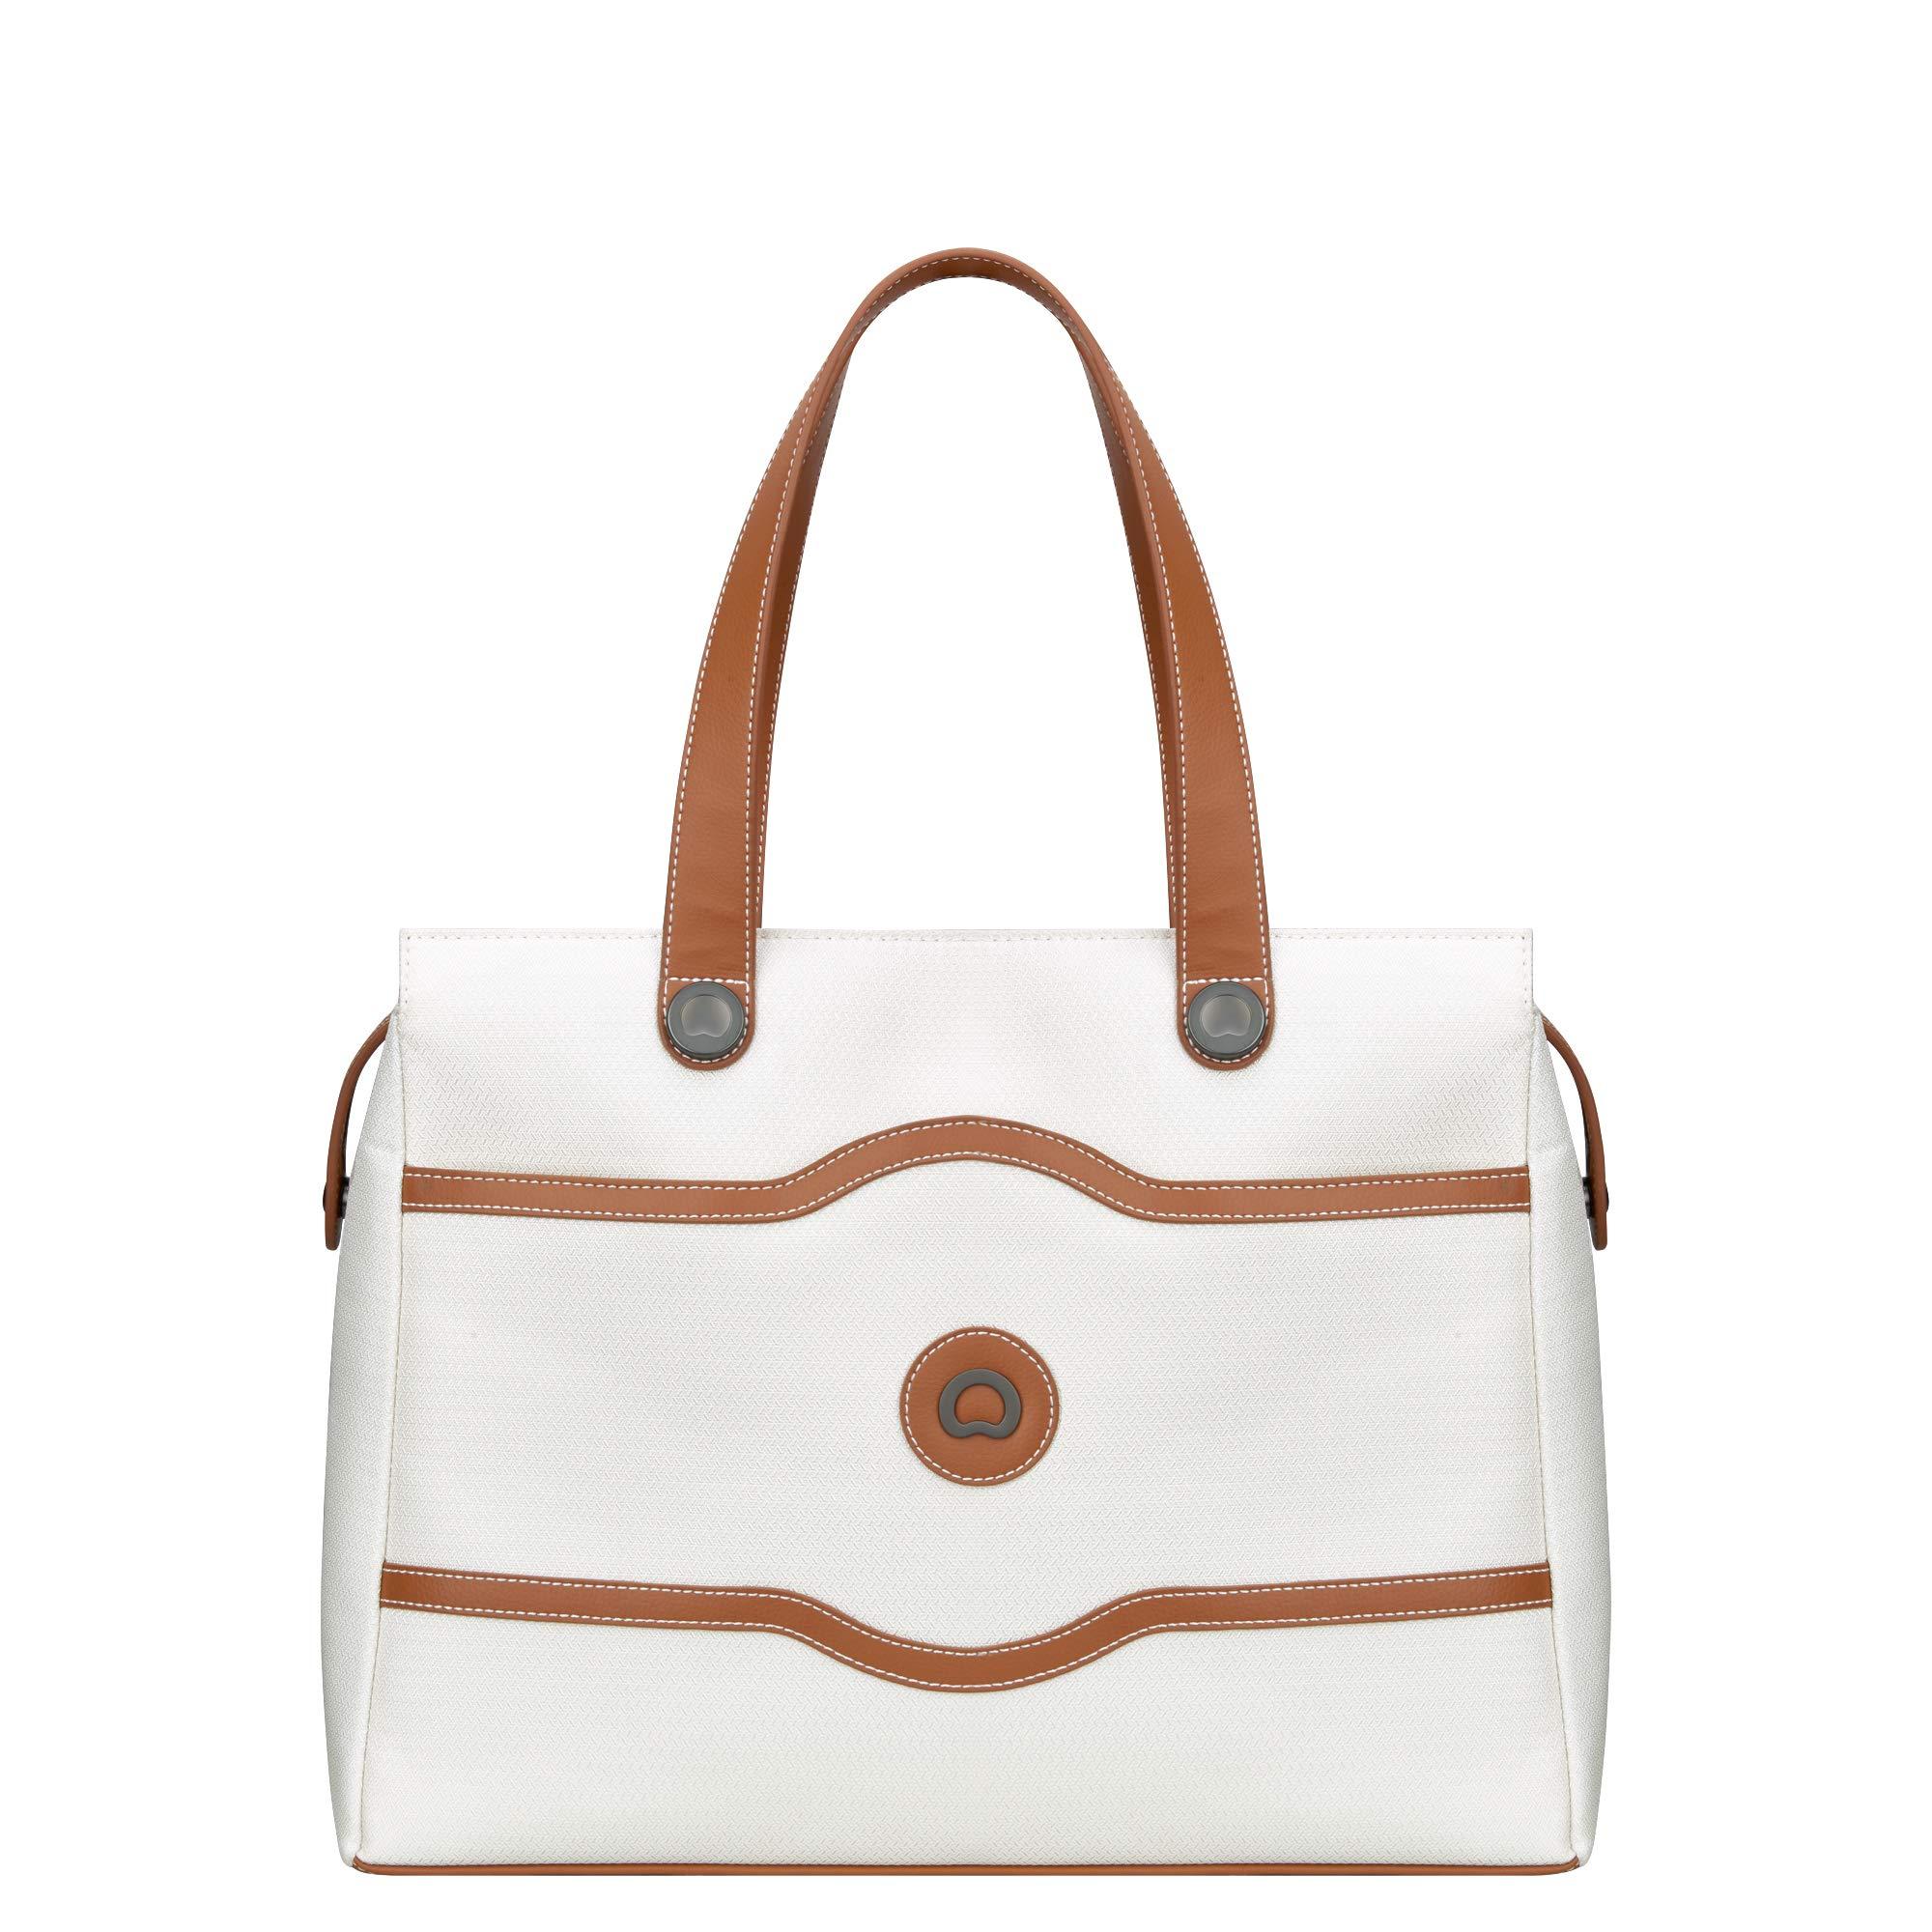 DELSEY Paris Luggage Chatelet Soft Air Shoulder Bag, Champagne One Size